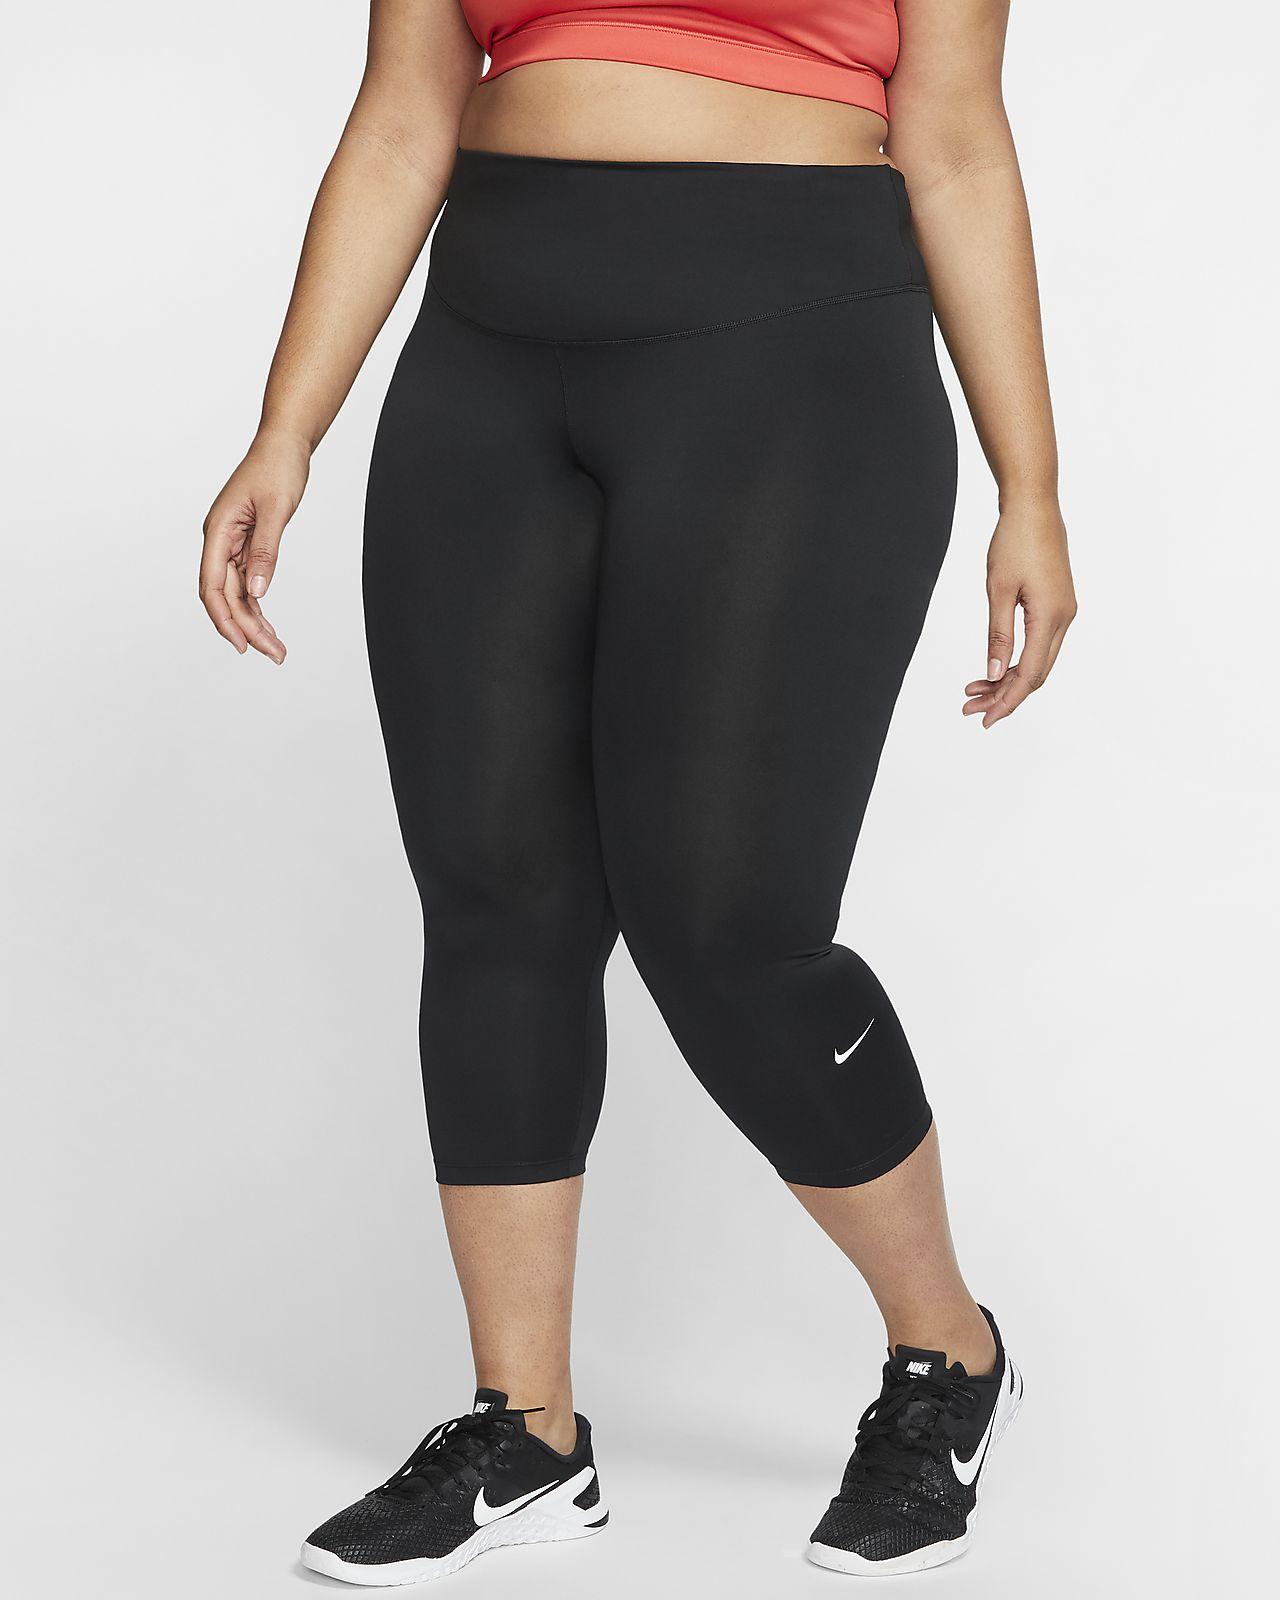 Tights curtas Nike One para mulher (tamanhos grandes)